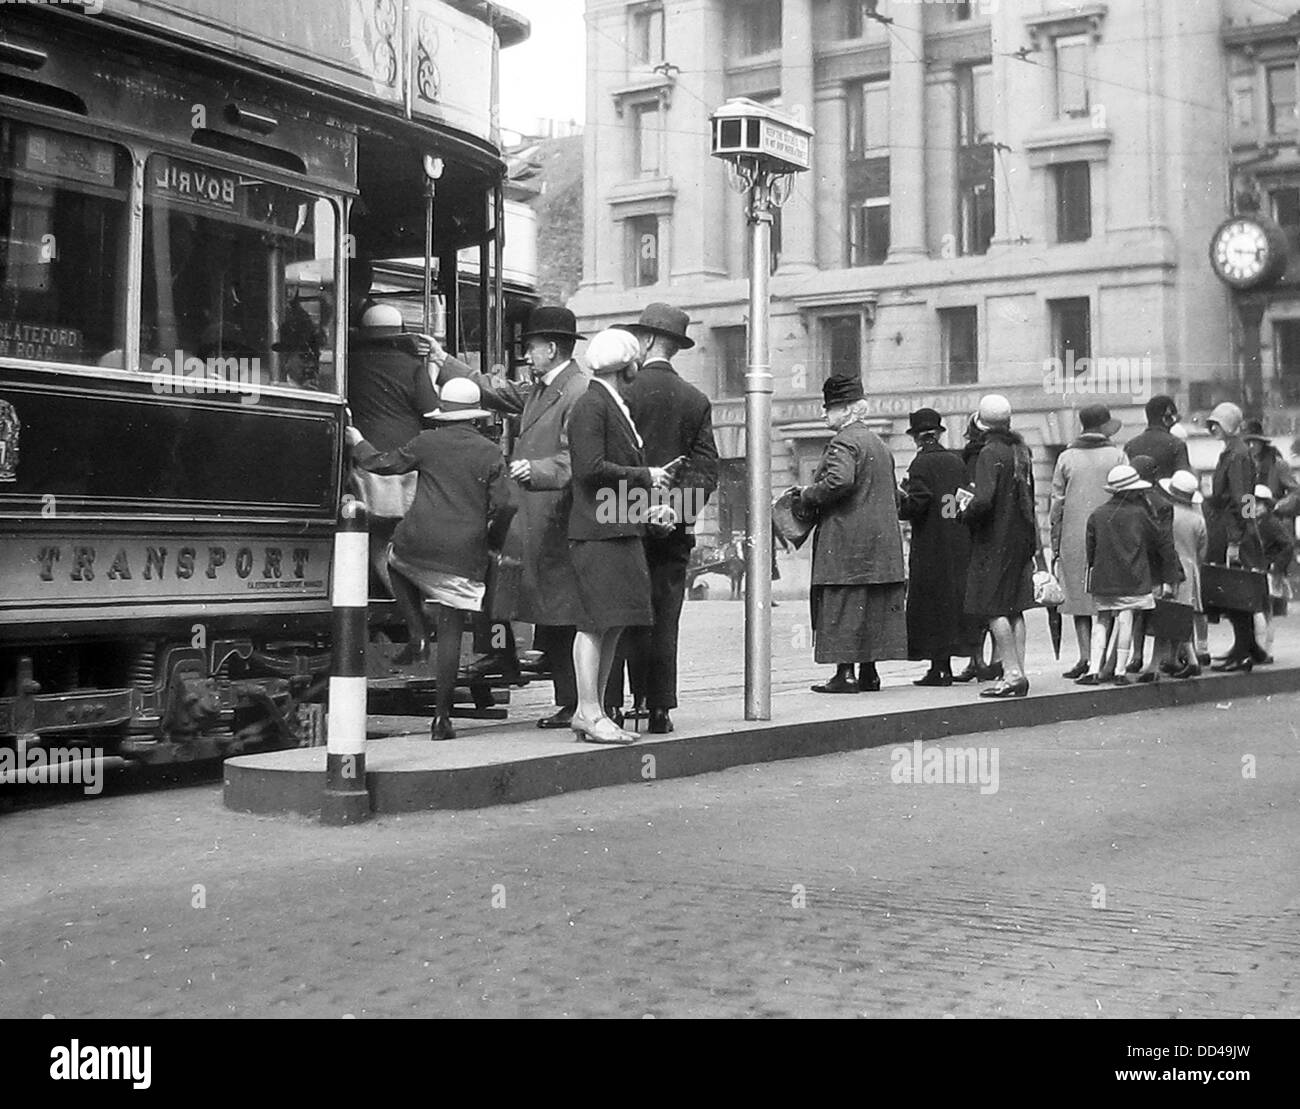 Edinburgh Tram probably 1940s - Stock Image